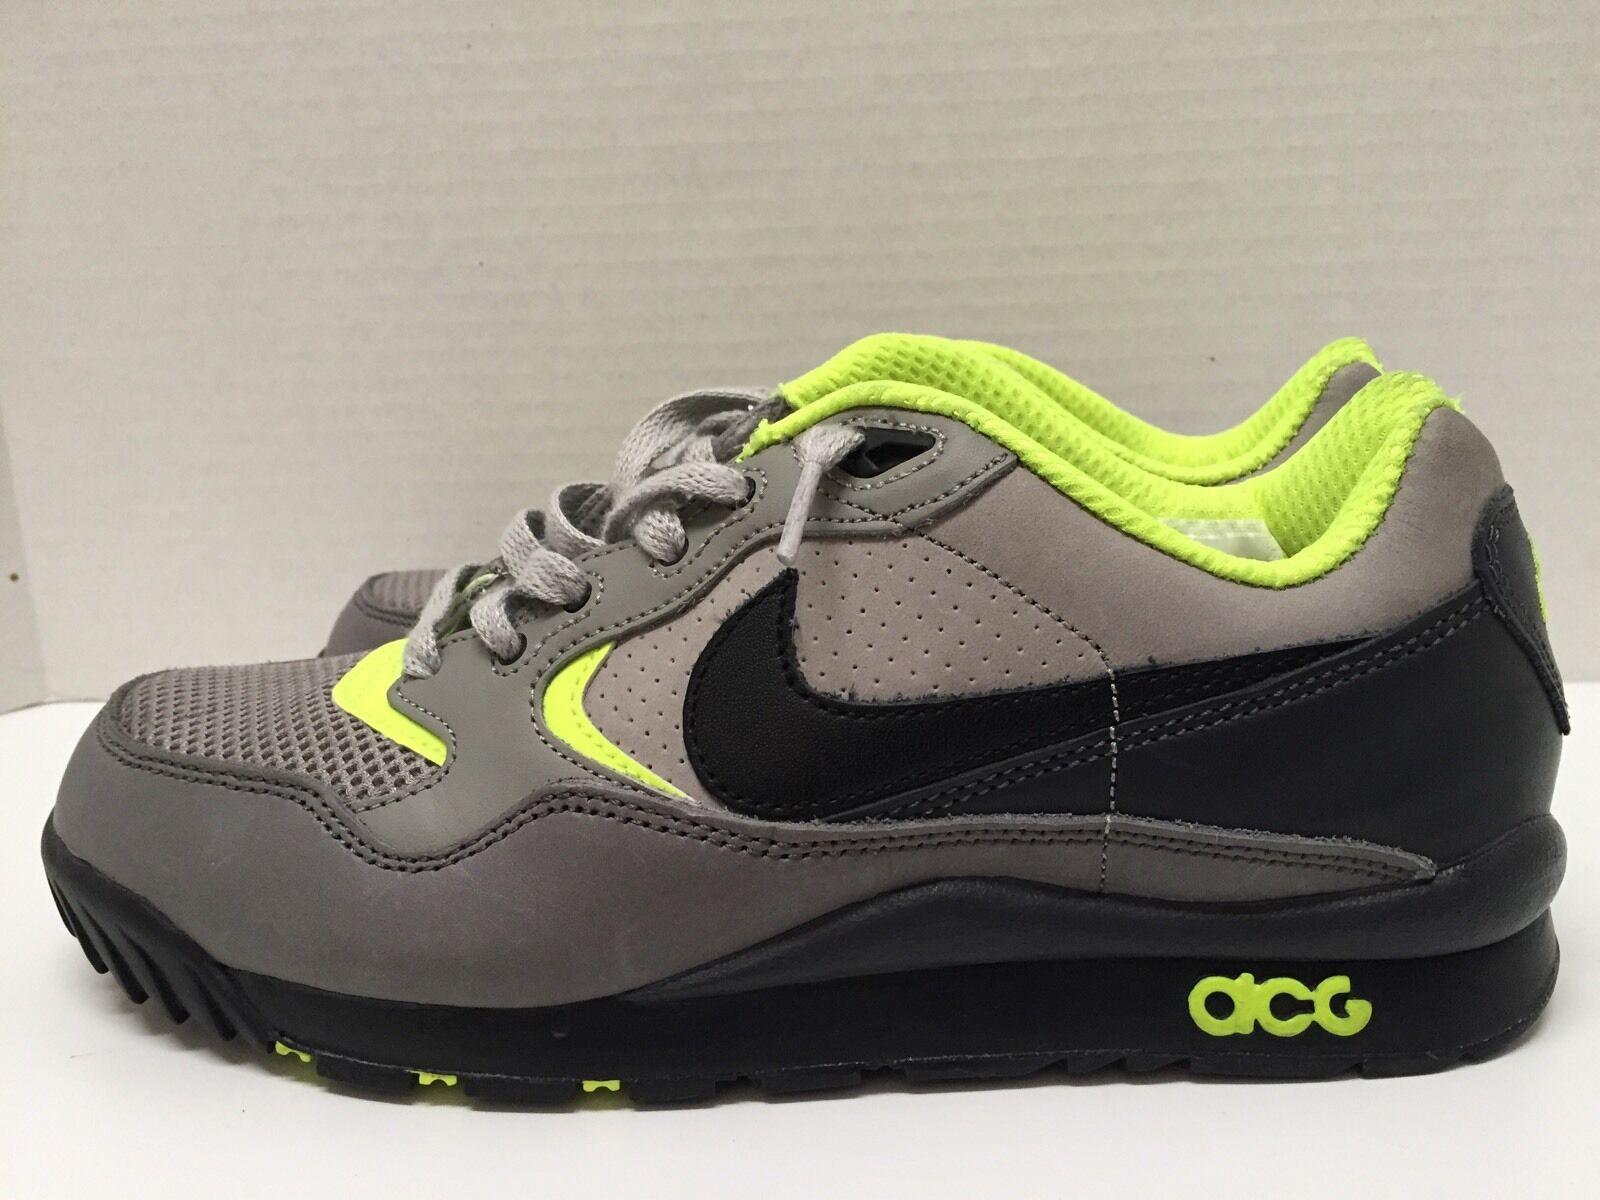 Nuove nike air wildwood casual traccia le uomini 8 scarpe 377757 002 sz 8 uomini neri. d1f93a